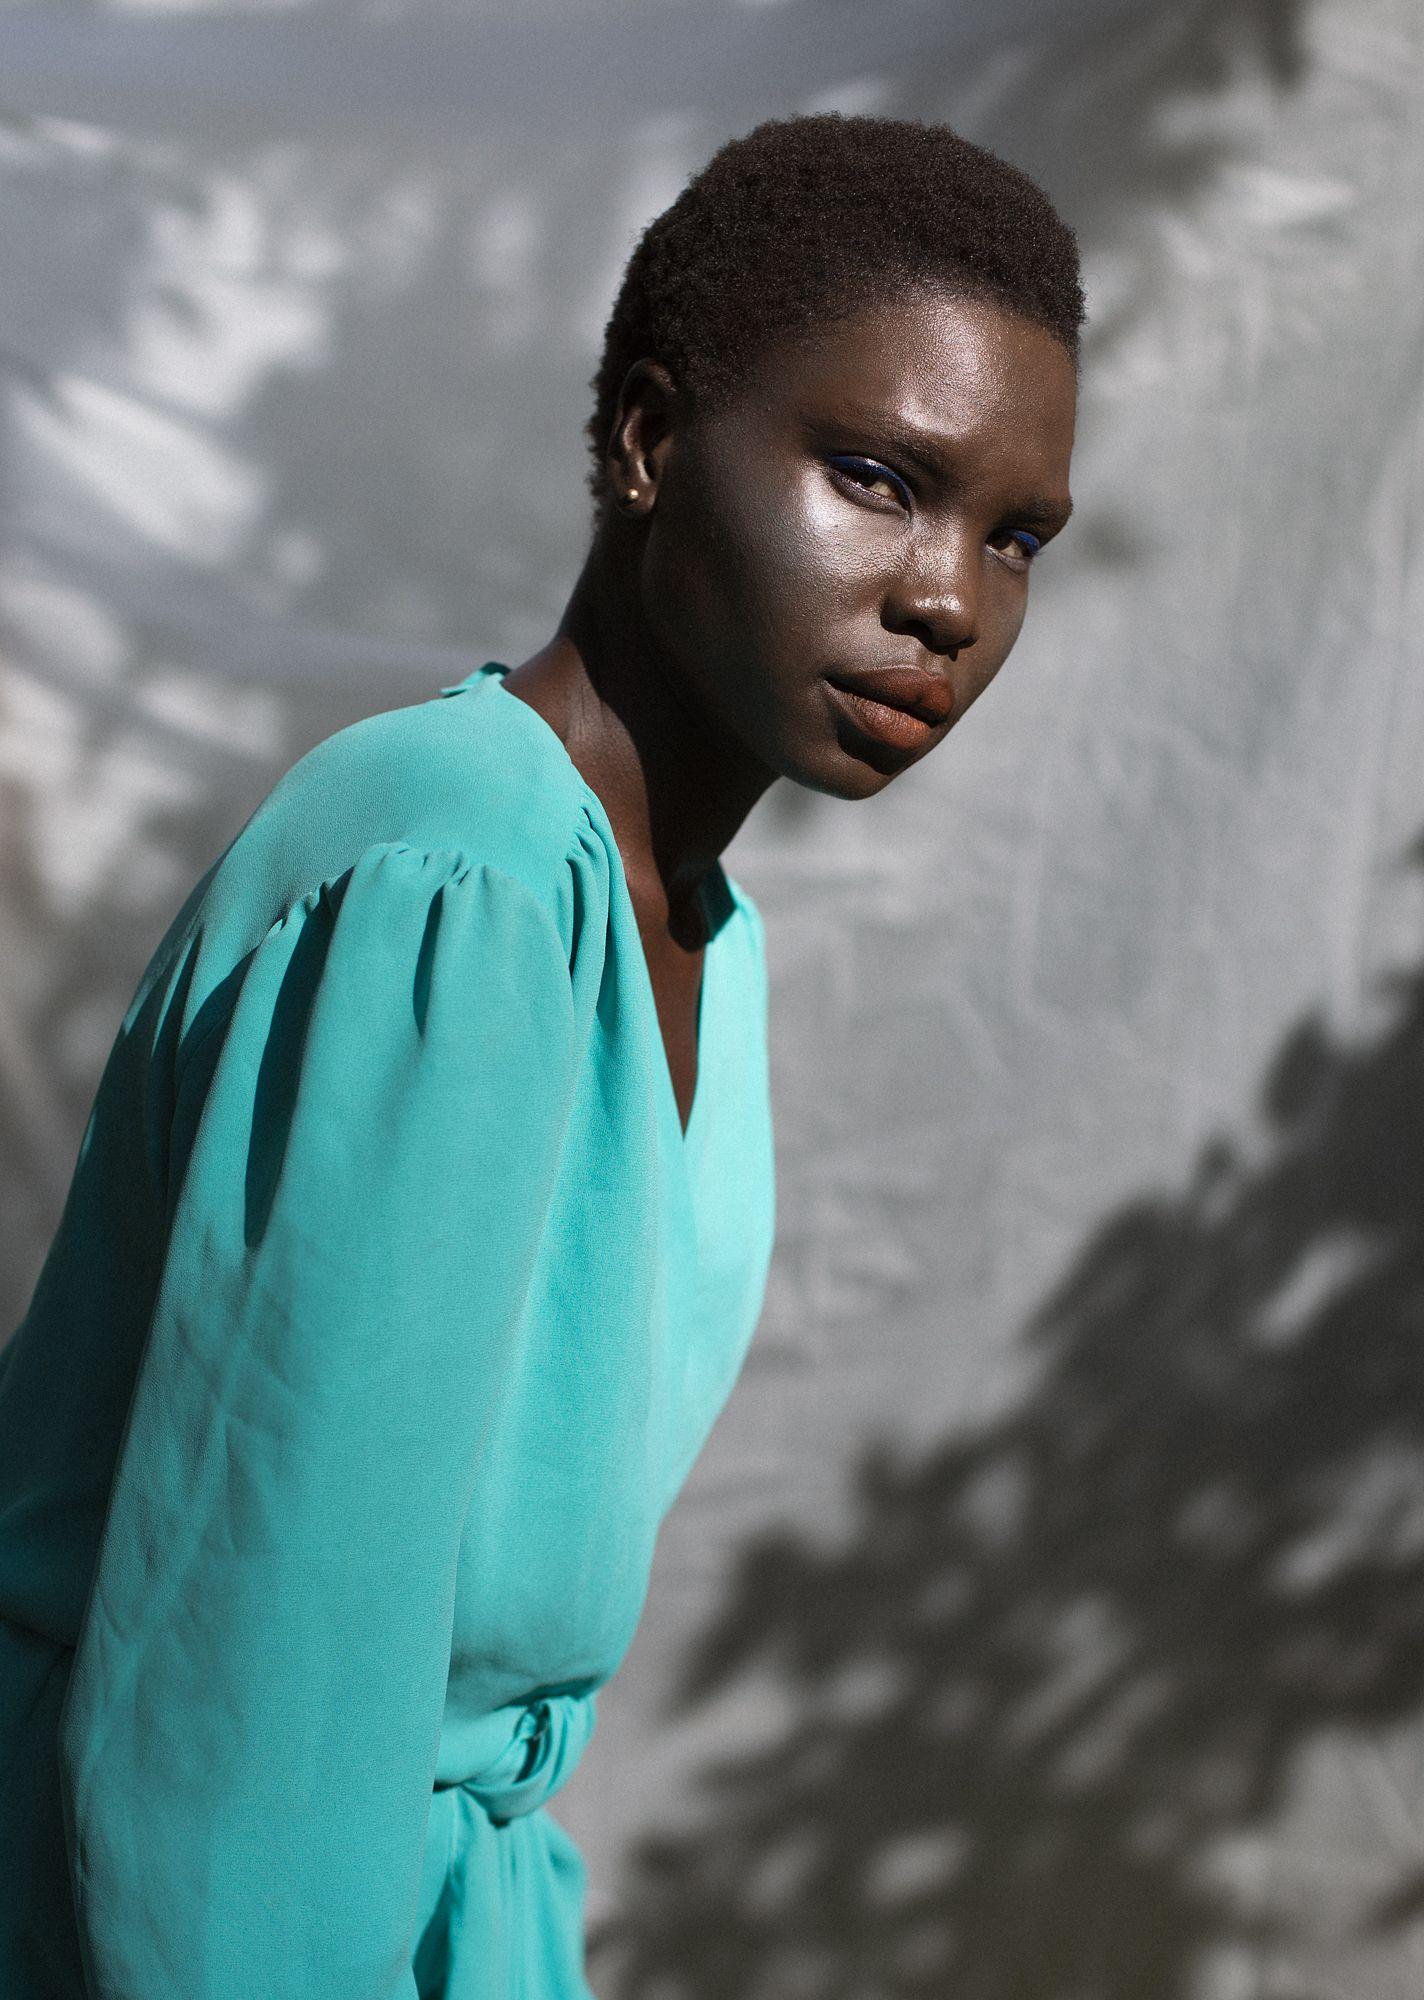 WILDFLOWER / SVETLANA JOVANOVIC | Fashion Photography